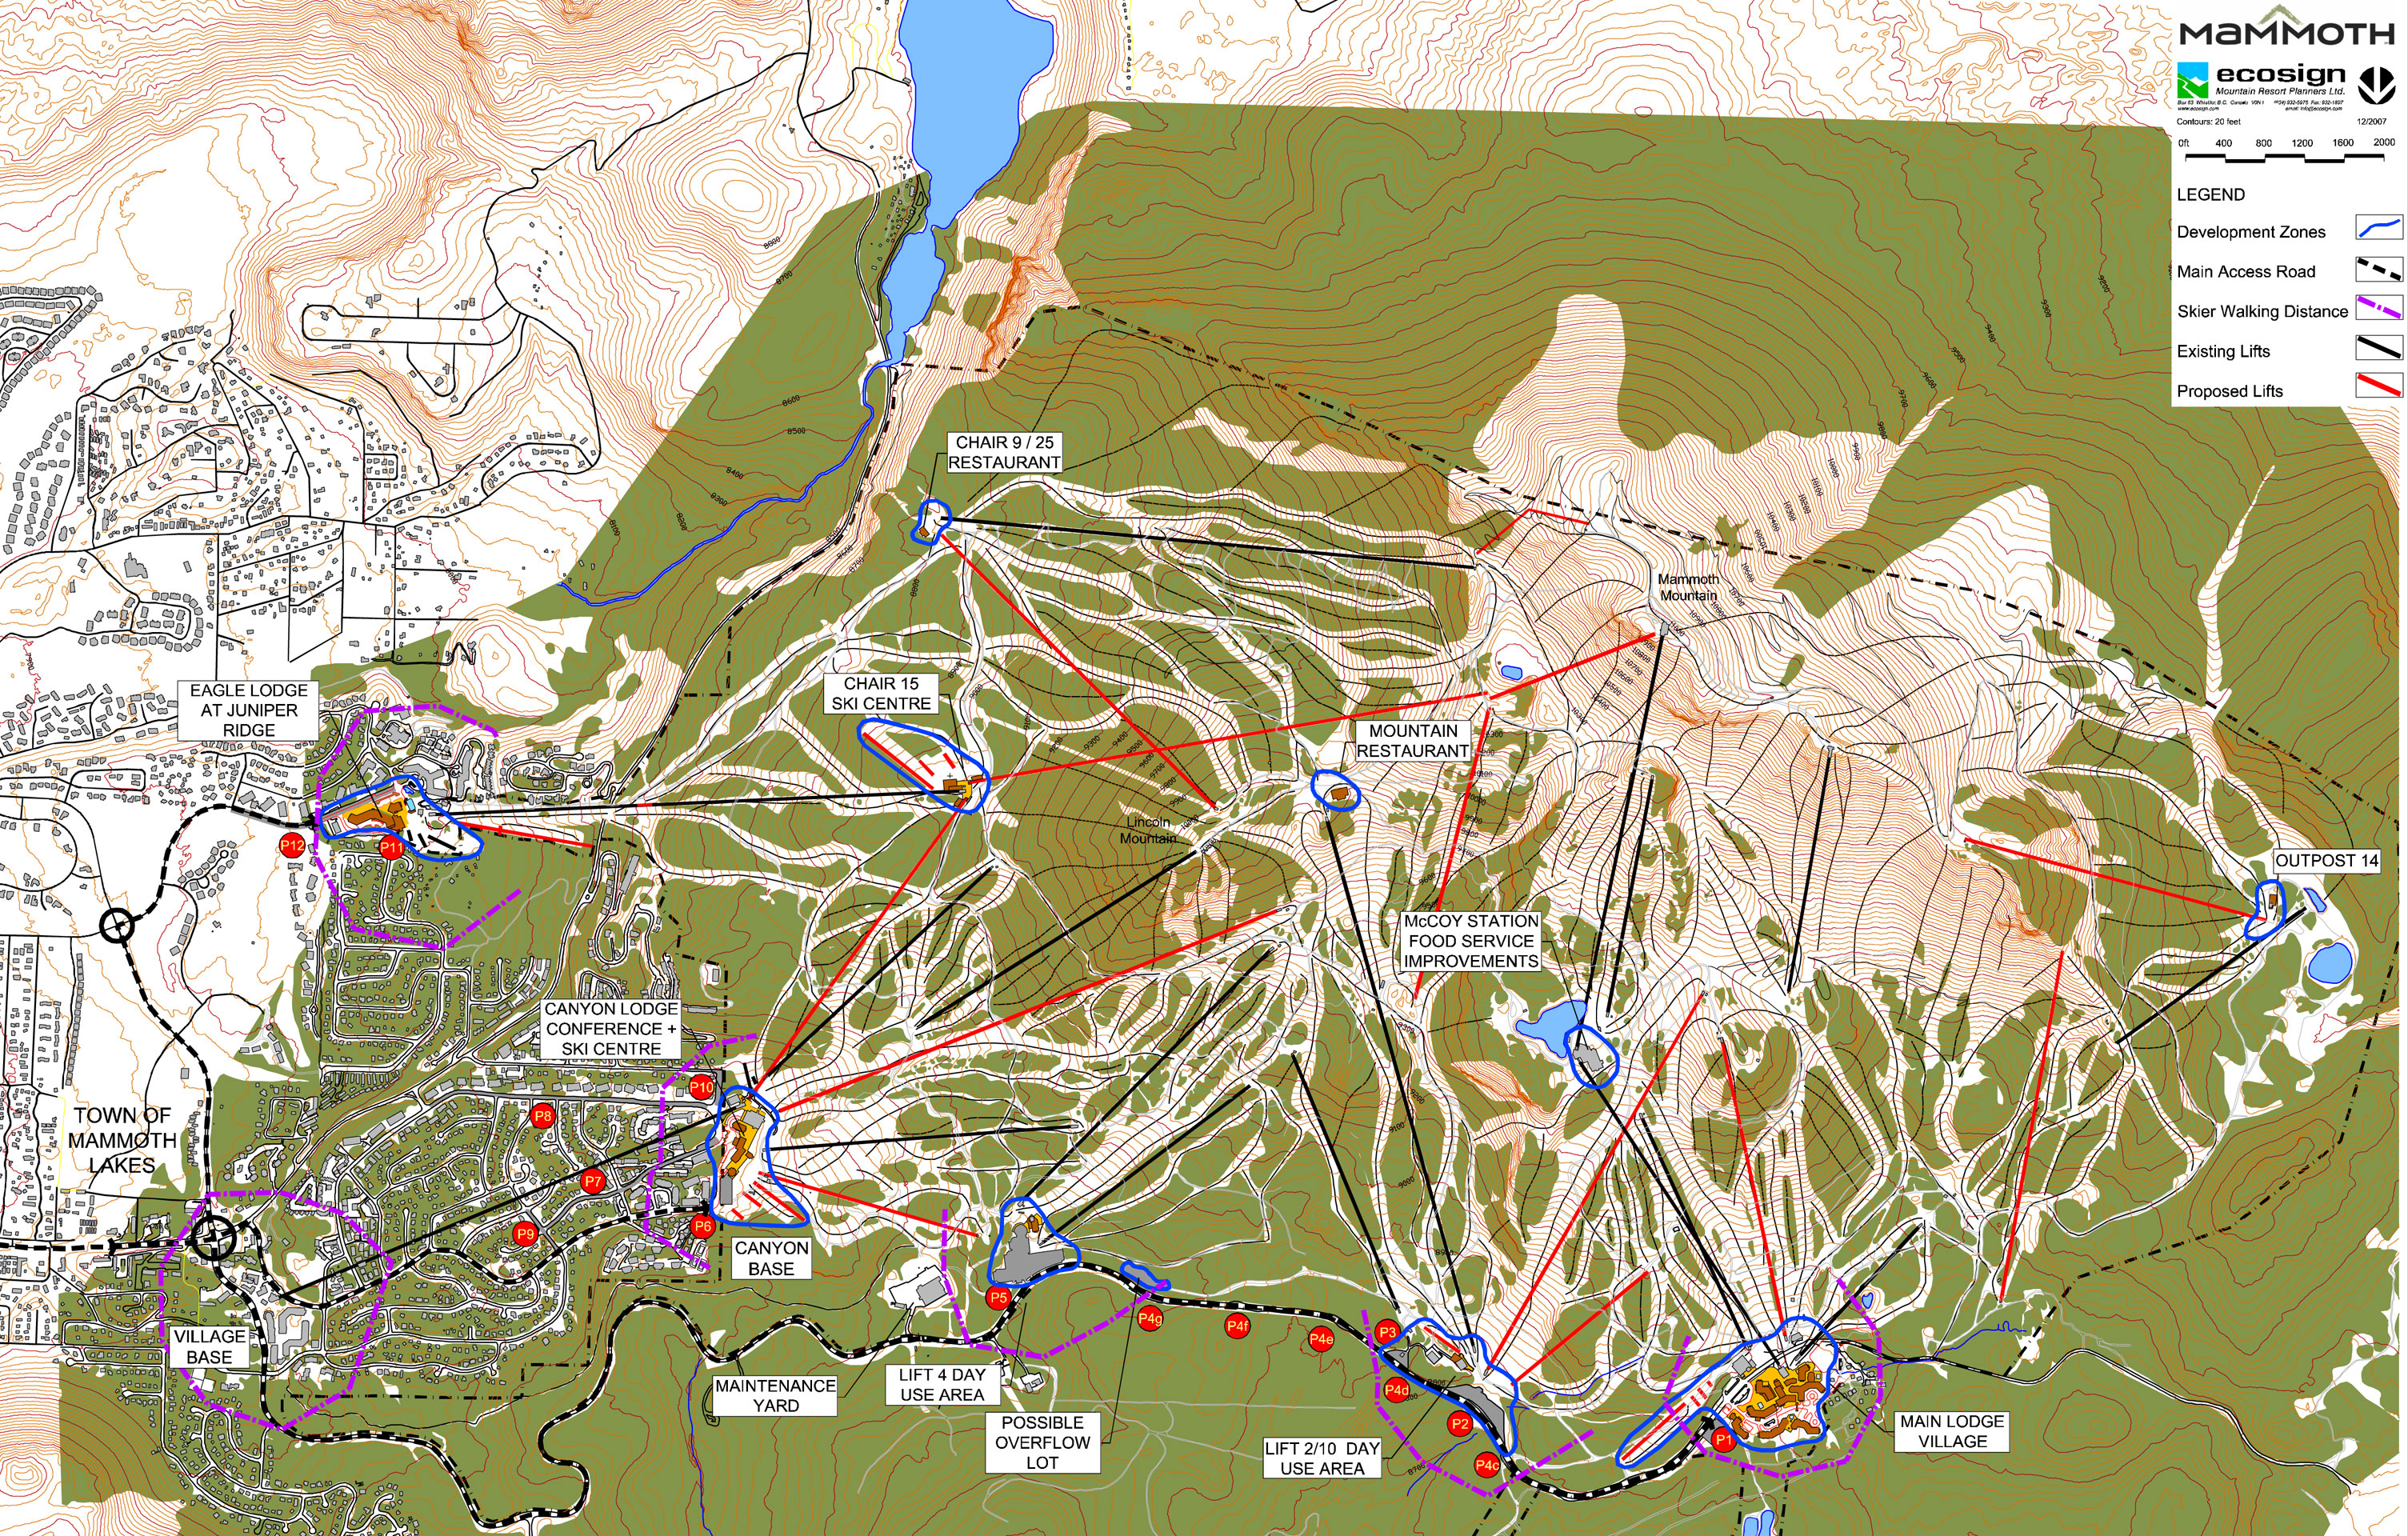 Mapping Mammoth's Next New Lifts – Lift Blog on june lake lodging map, monterey lodging map, canyons resort lodging map, mammoth city map, yosemite lodging map, mammoth cave map, mammoth village map, mammoth fishing map, biggest ski mountain map, mammoth hiking map, mammoth transit map, park city lodging map, mammoth mtn map, mammoth campgrounds map, alta lodging map, northstar lodging map, mammoth trail map pdf, grand targhee lodging map, copper mountain lodging map, mammoth ca map,